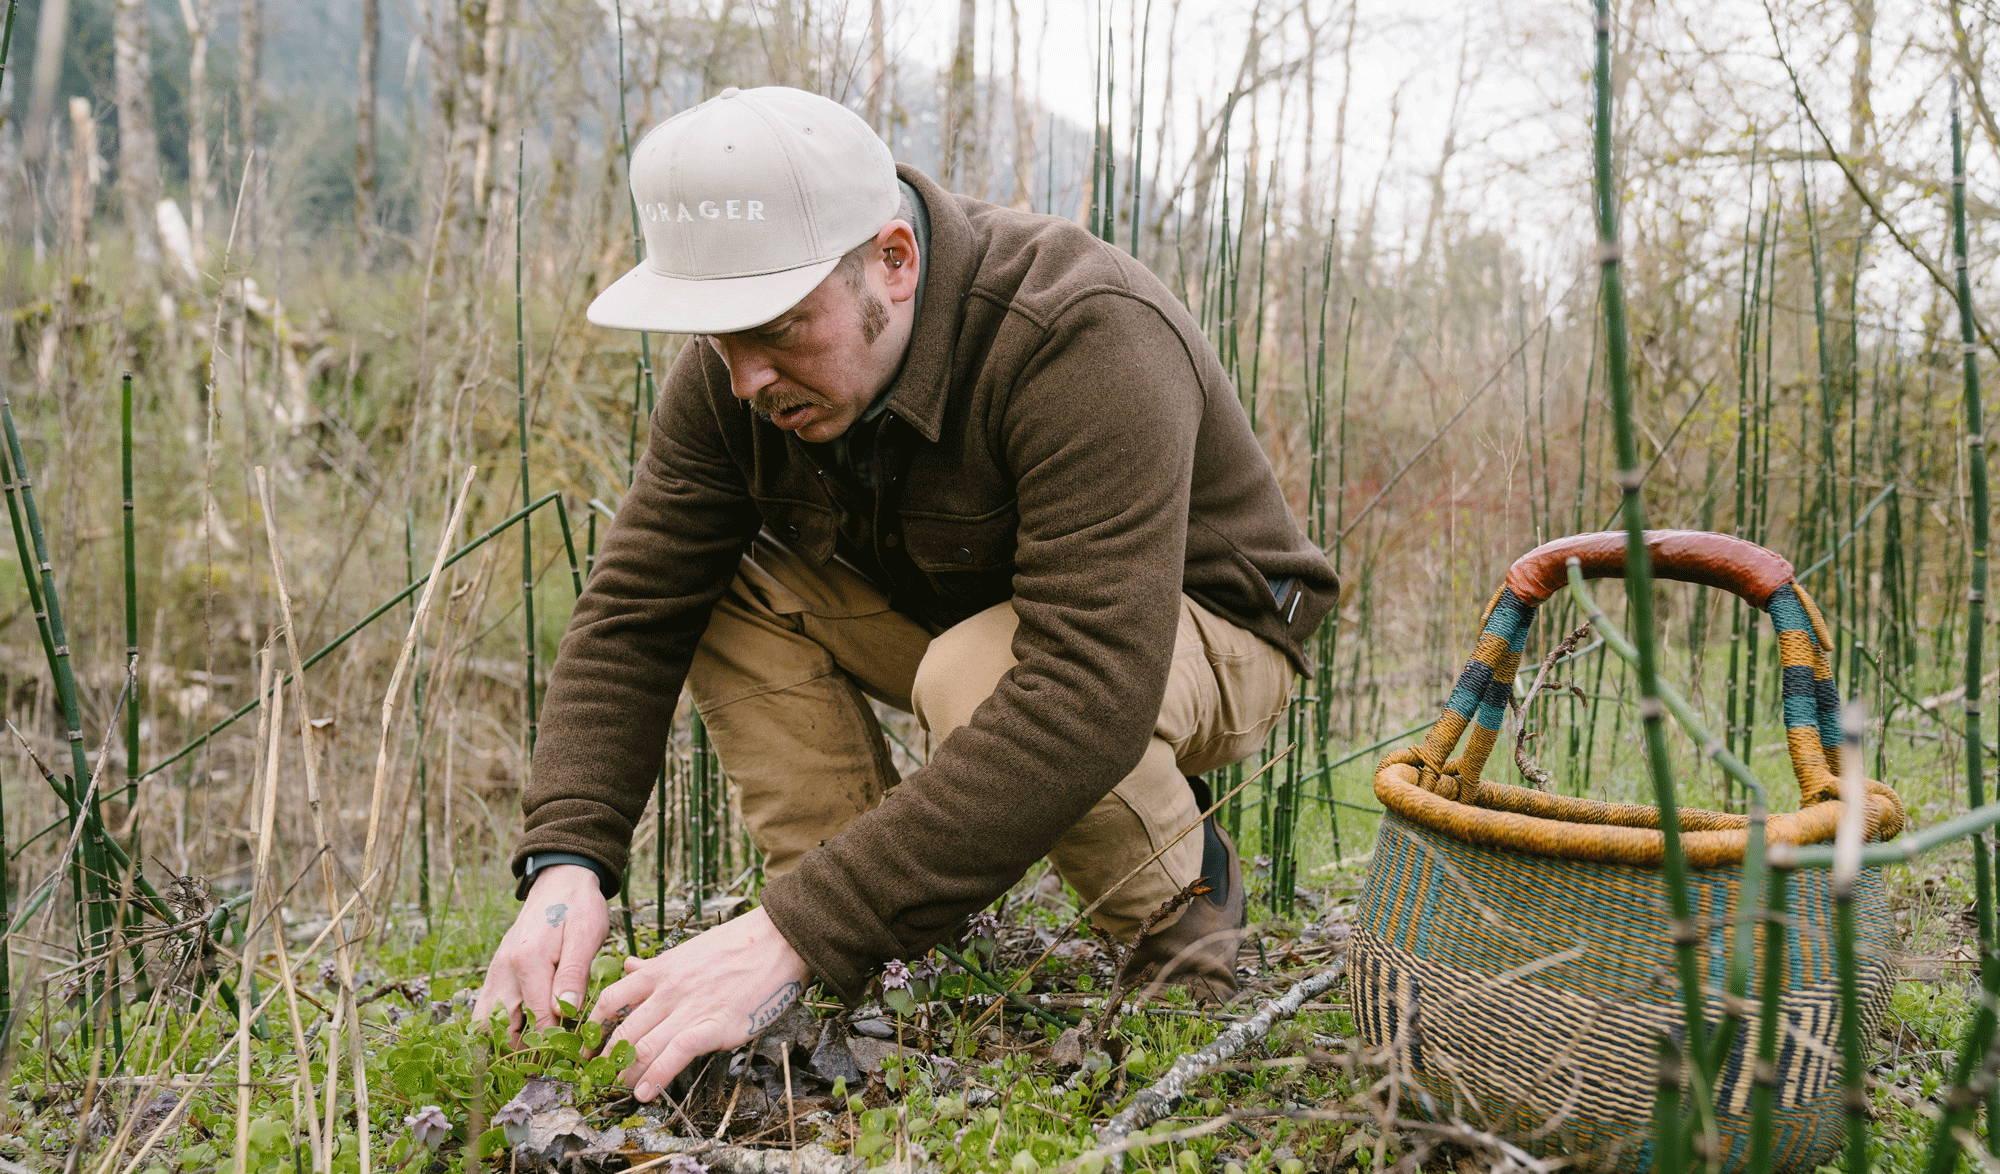 Man foraging for mushrooms